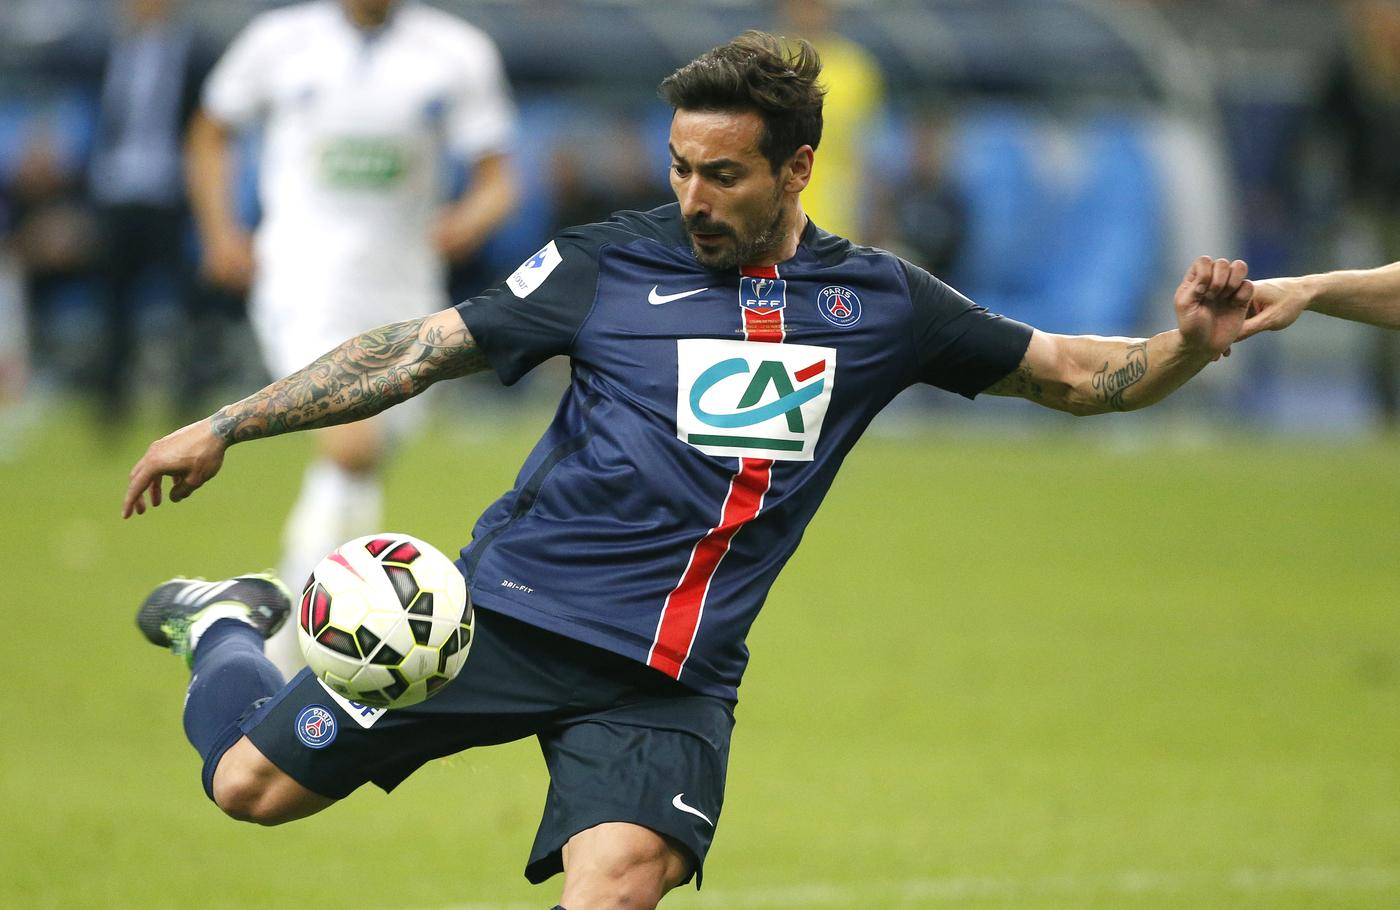 Arsenal handed boost in pursuit of Ezequiel Lavezzi as Paris Saint Germain winger wants transfer move – report